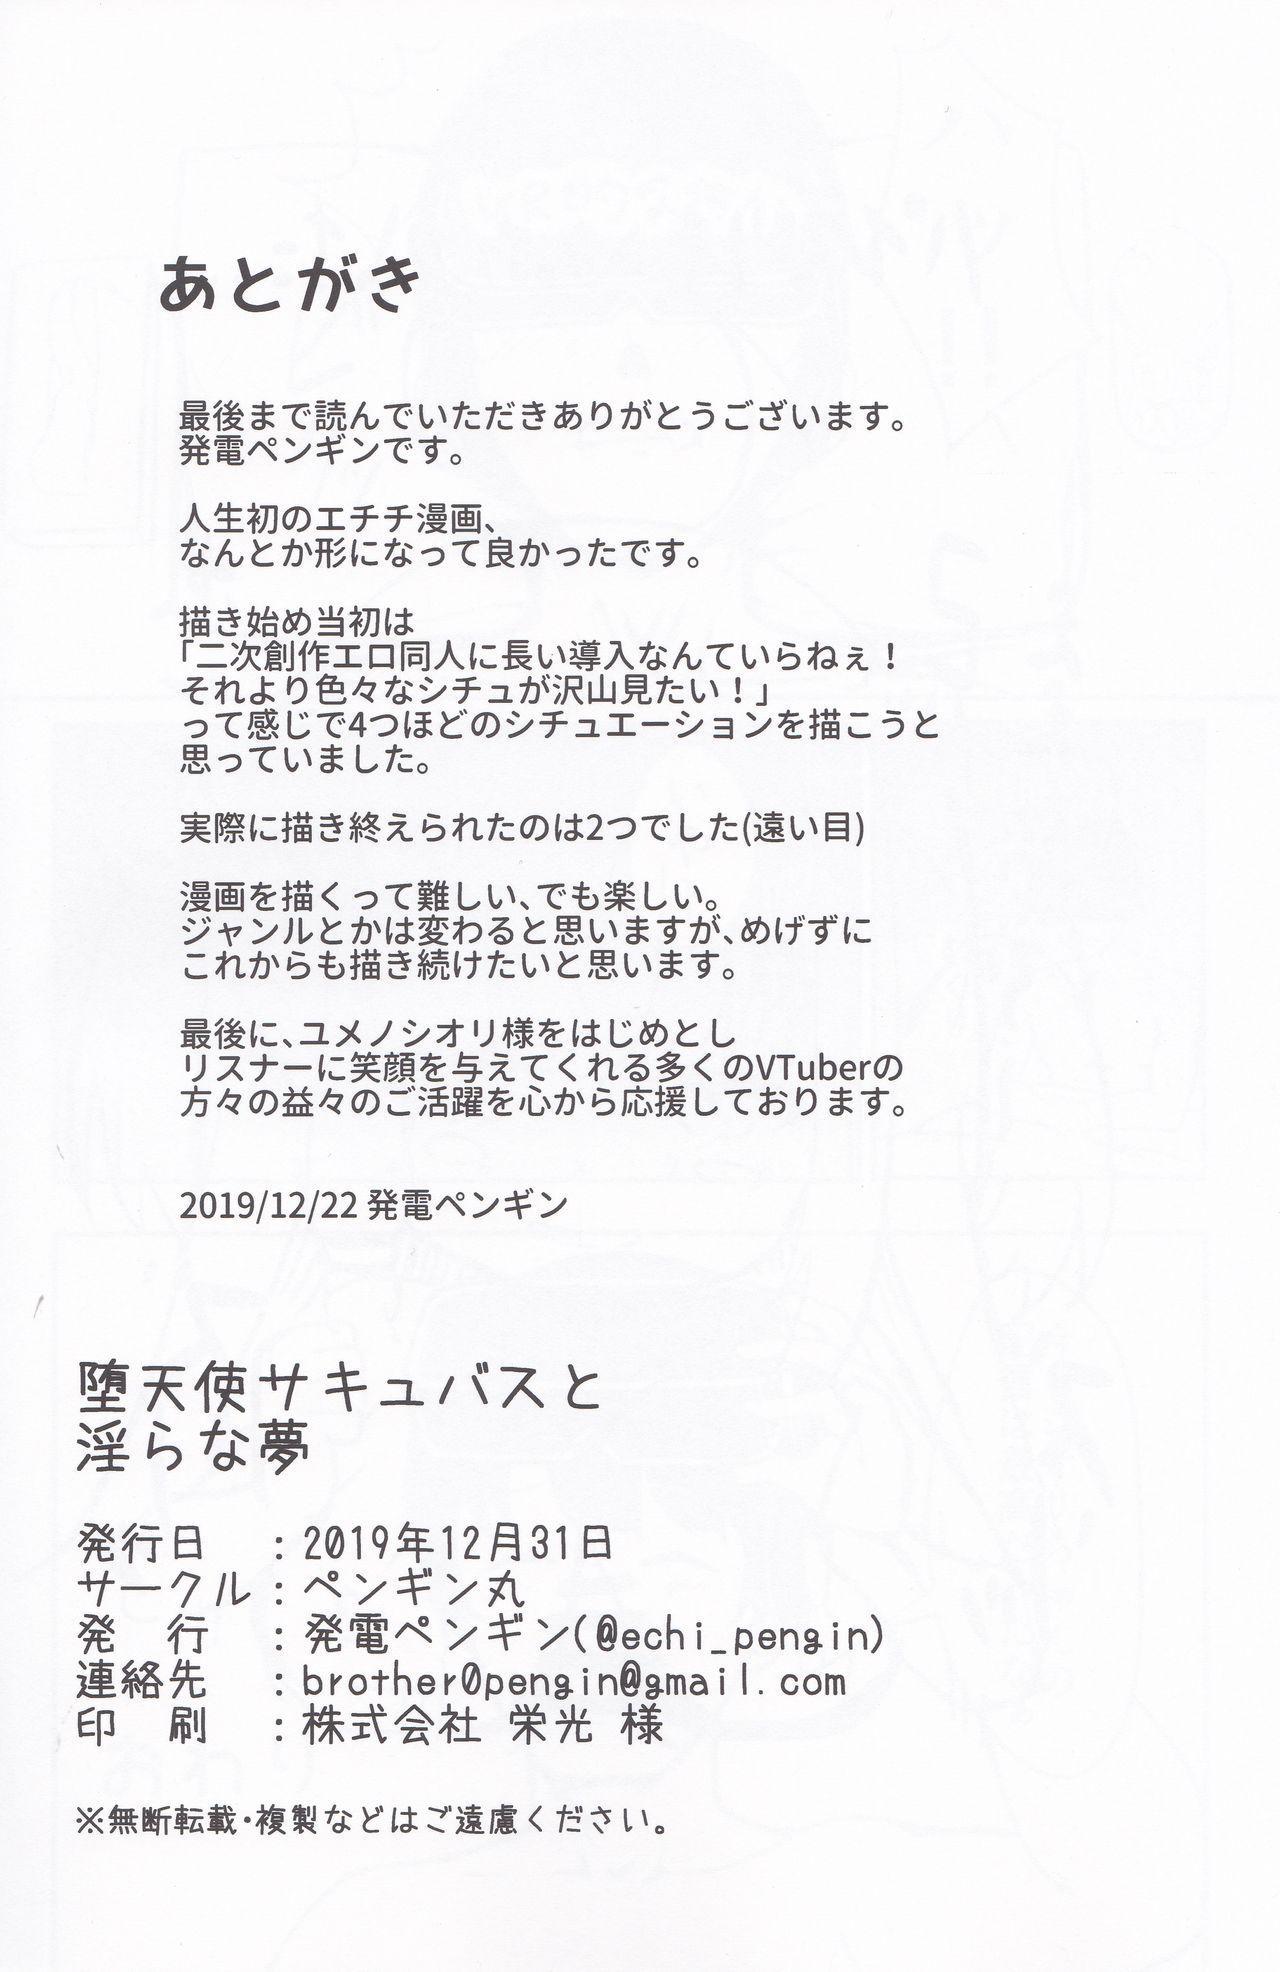 Datenshi Succubus to Midara na Yume 20